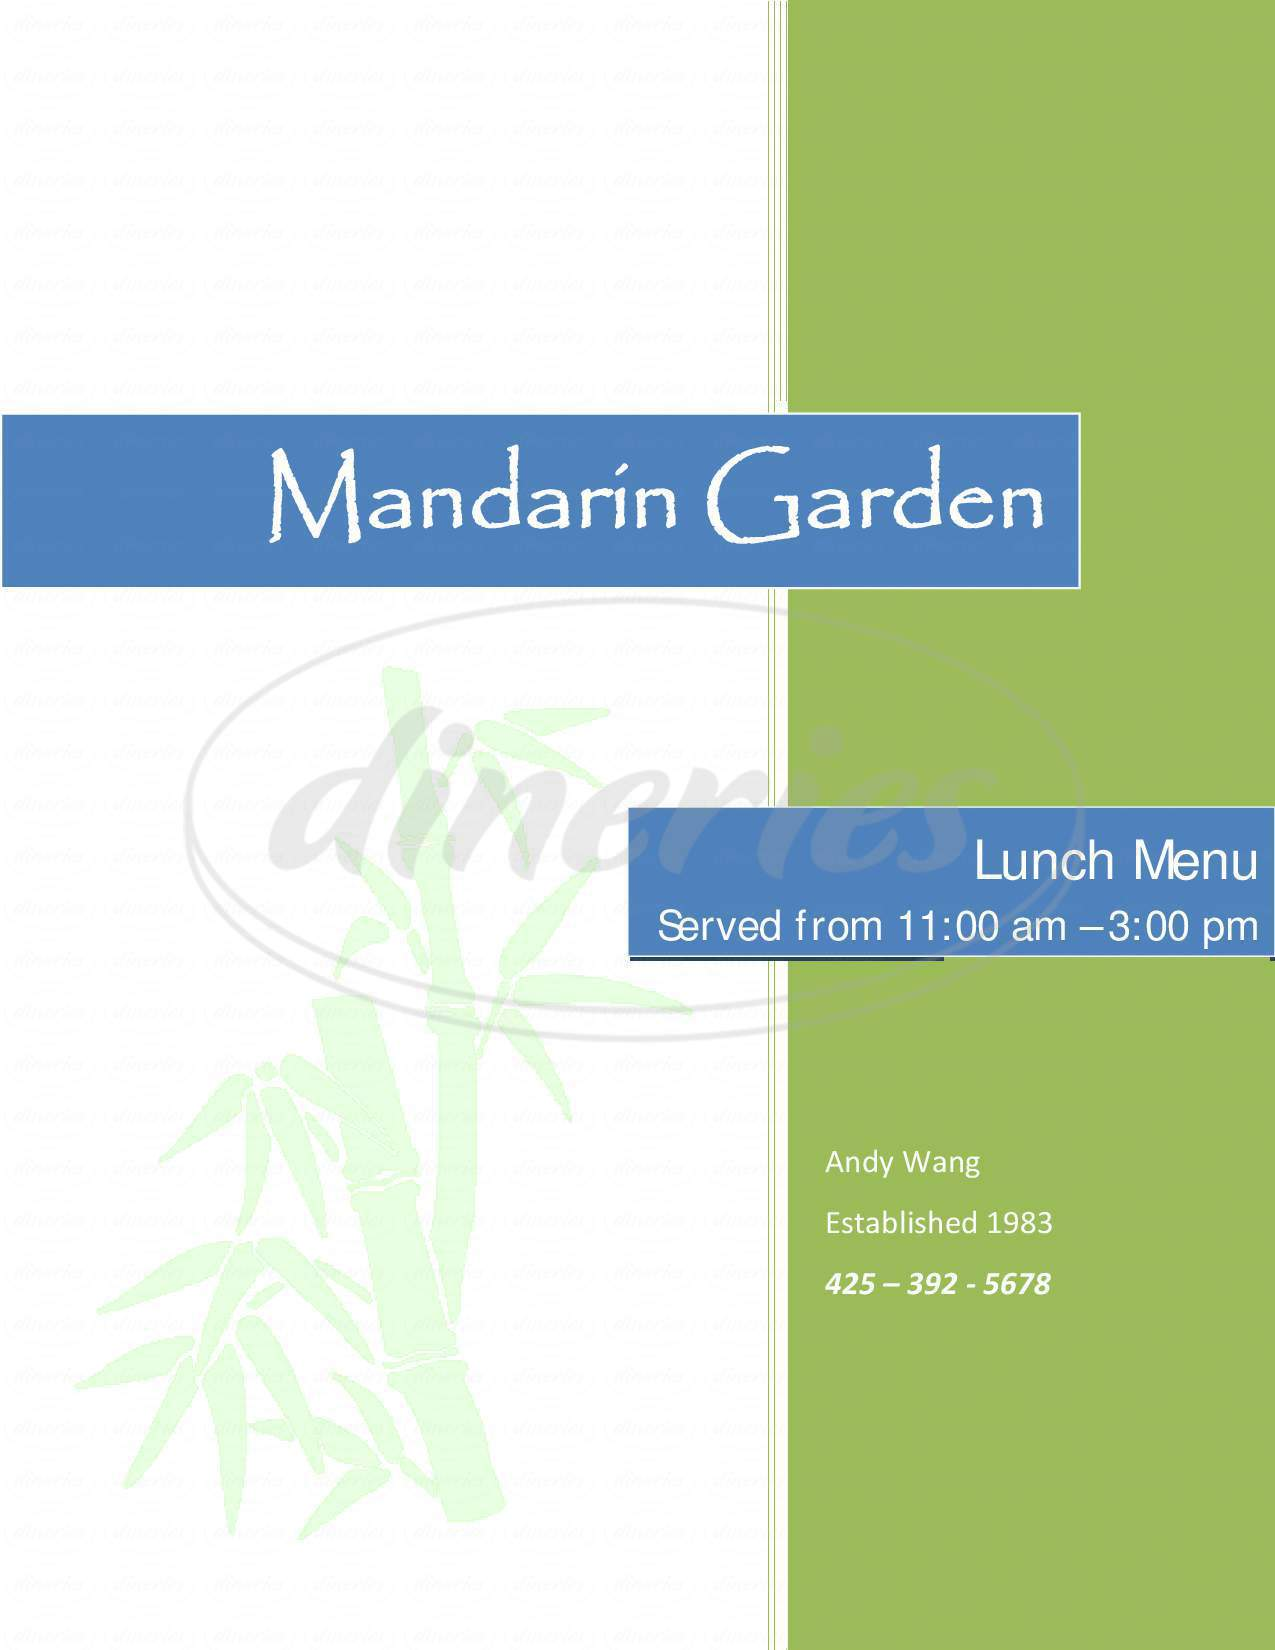 menu for Mandarin Garden